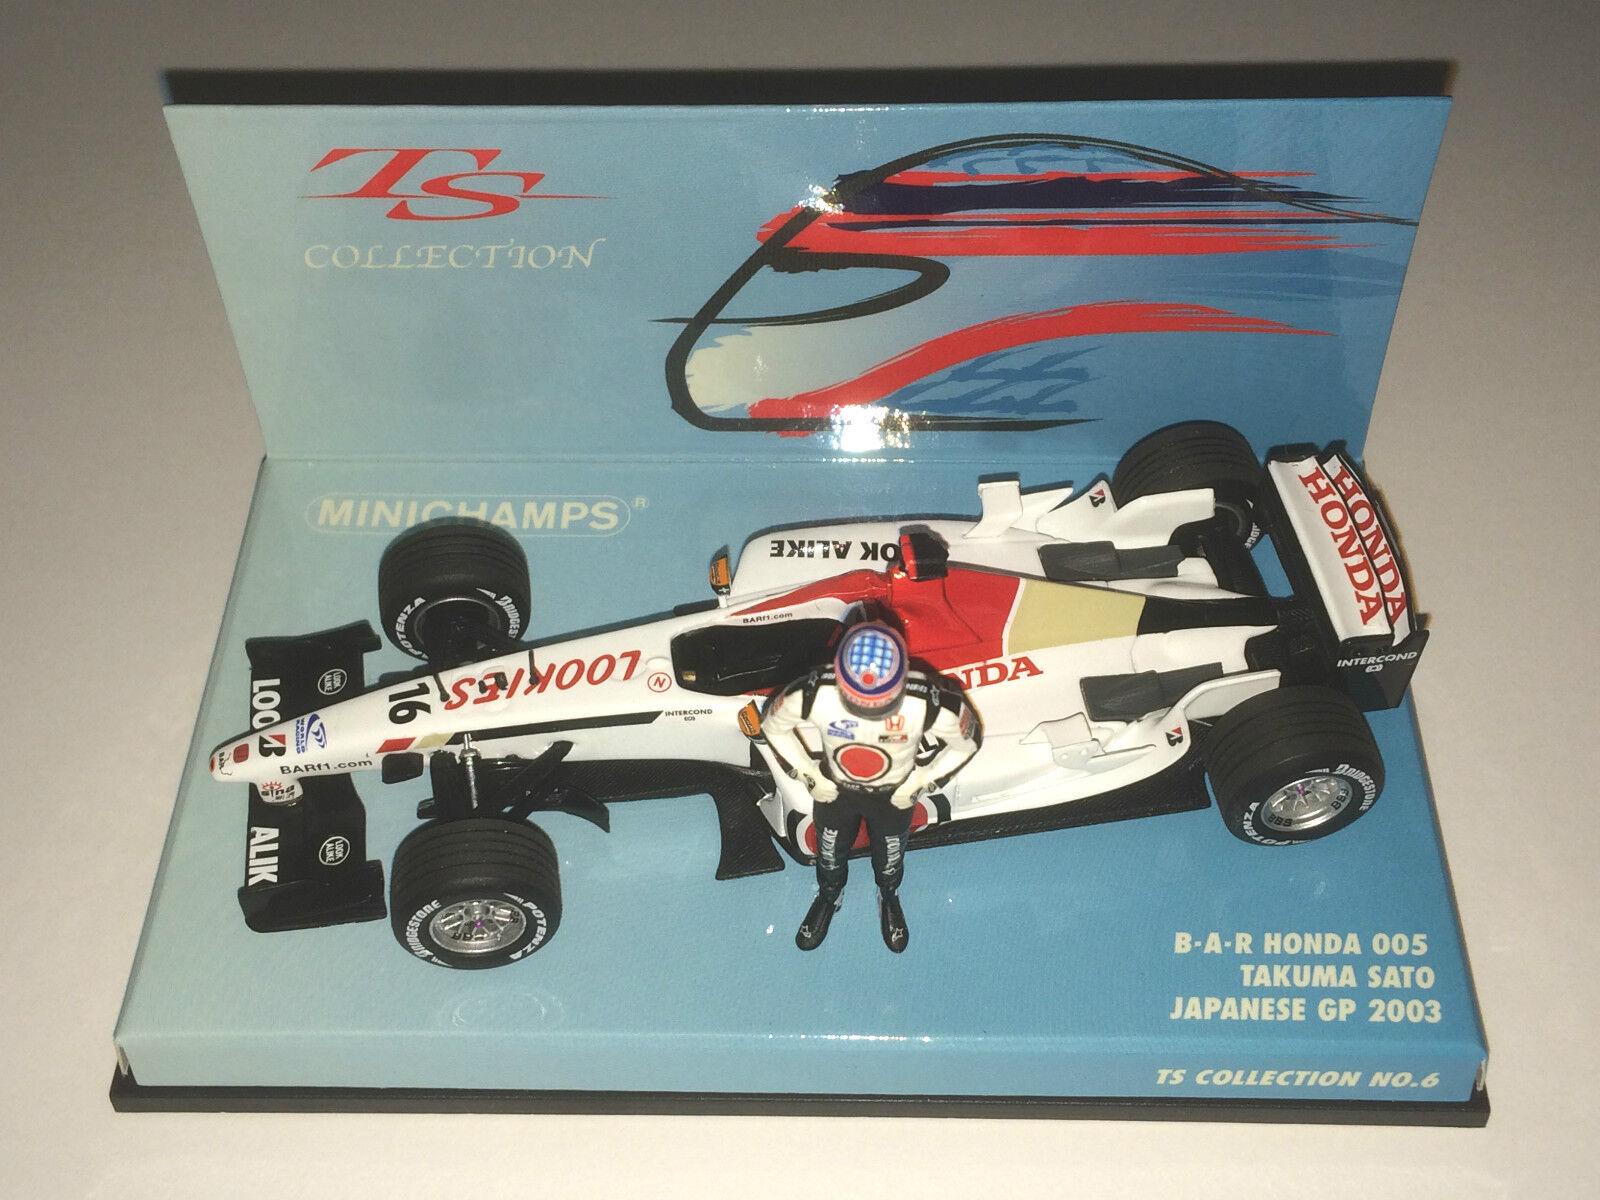 Minichamps F1 1 43 BAR HONDA 005 TAKUMA SATO JAPANESE GP 2003 & STANDING FIGURE